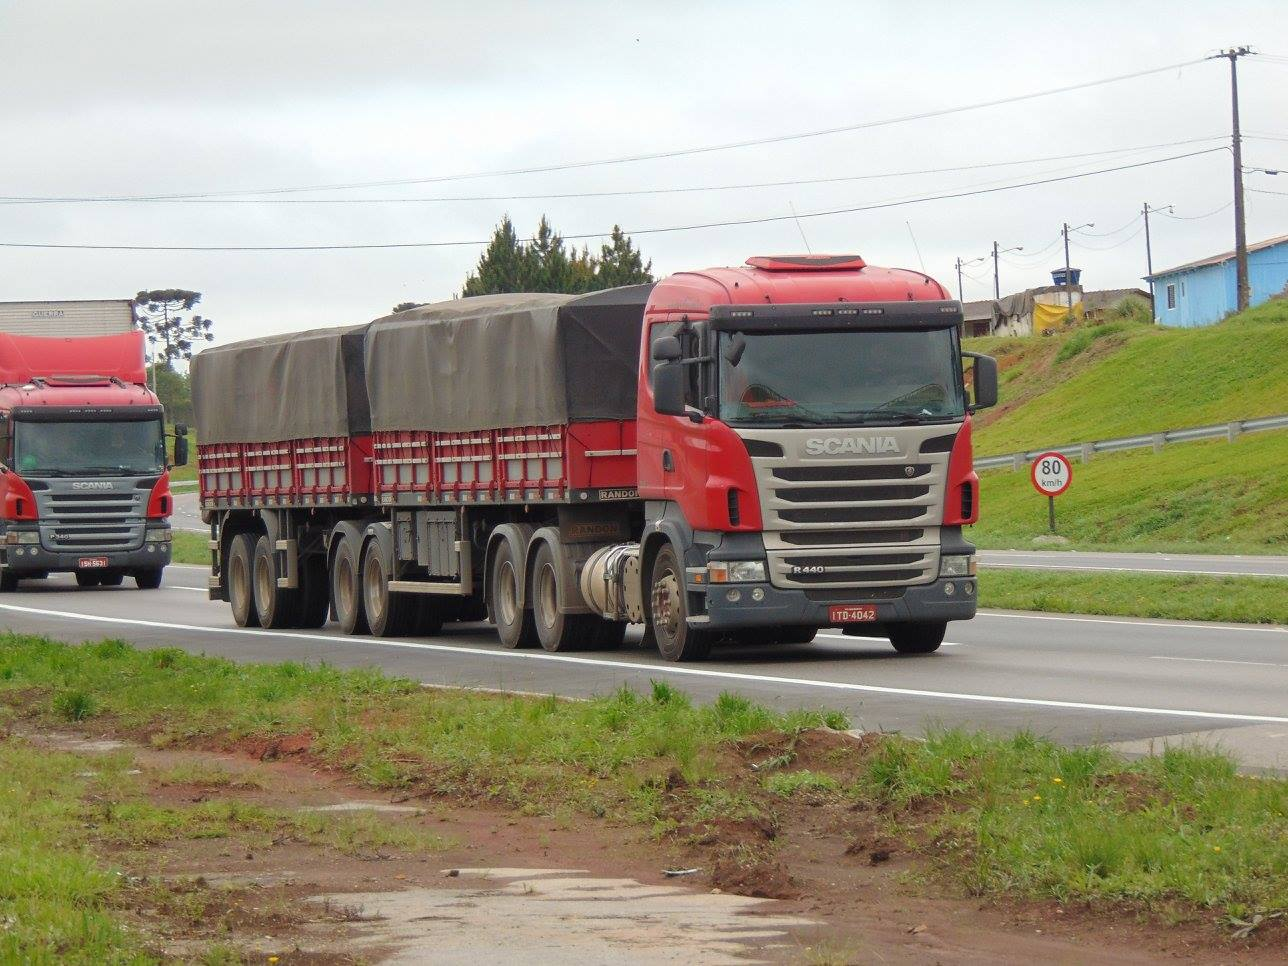 Scania-photo-5-1--2015-48